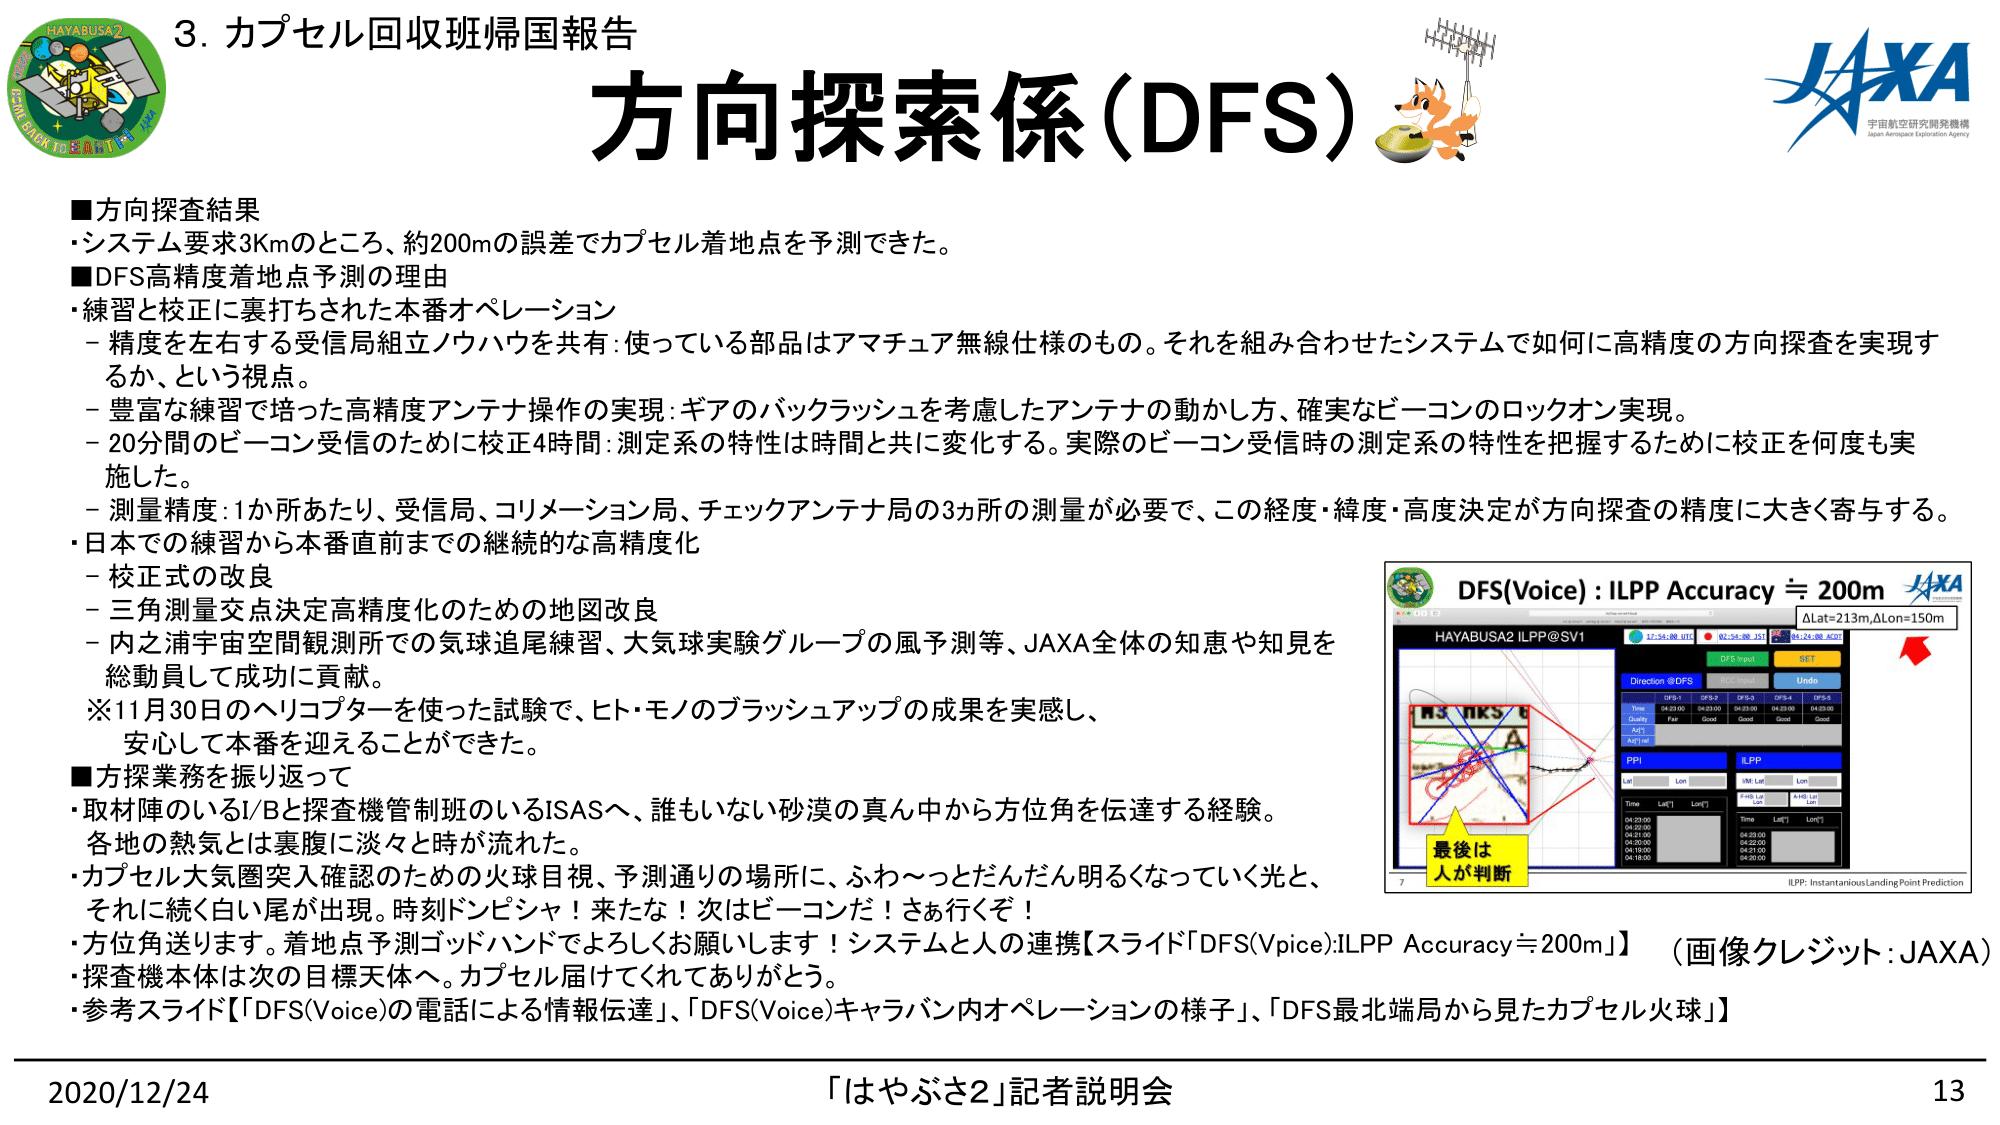 f:id:Imamura:20201224135114p:plain